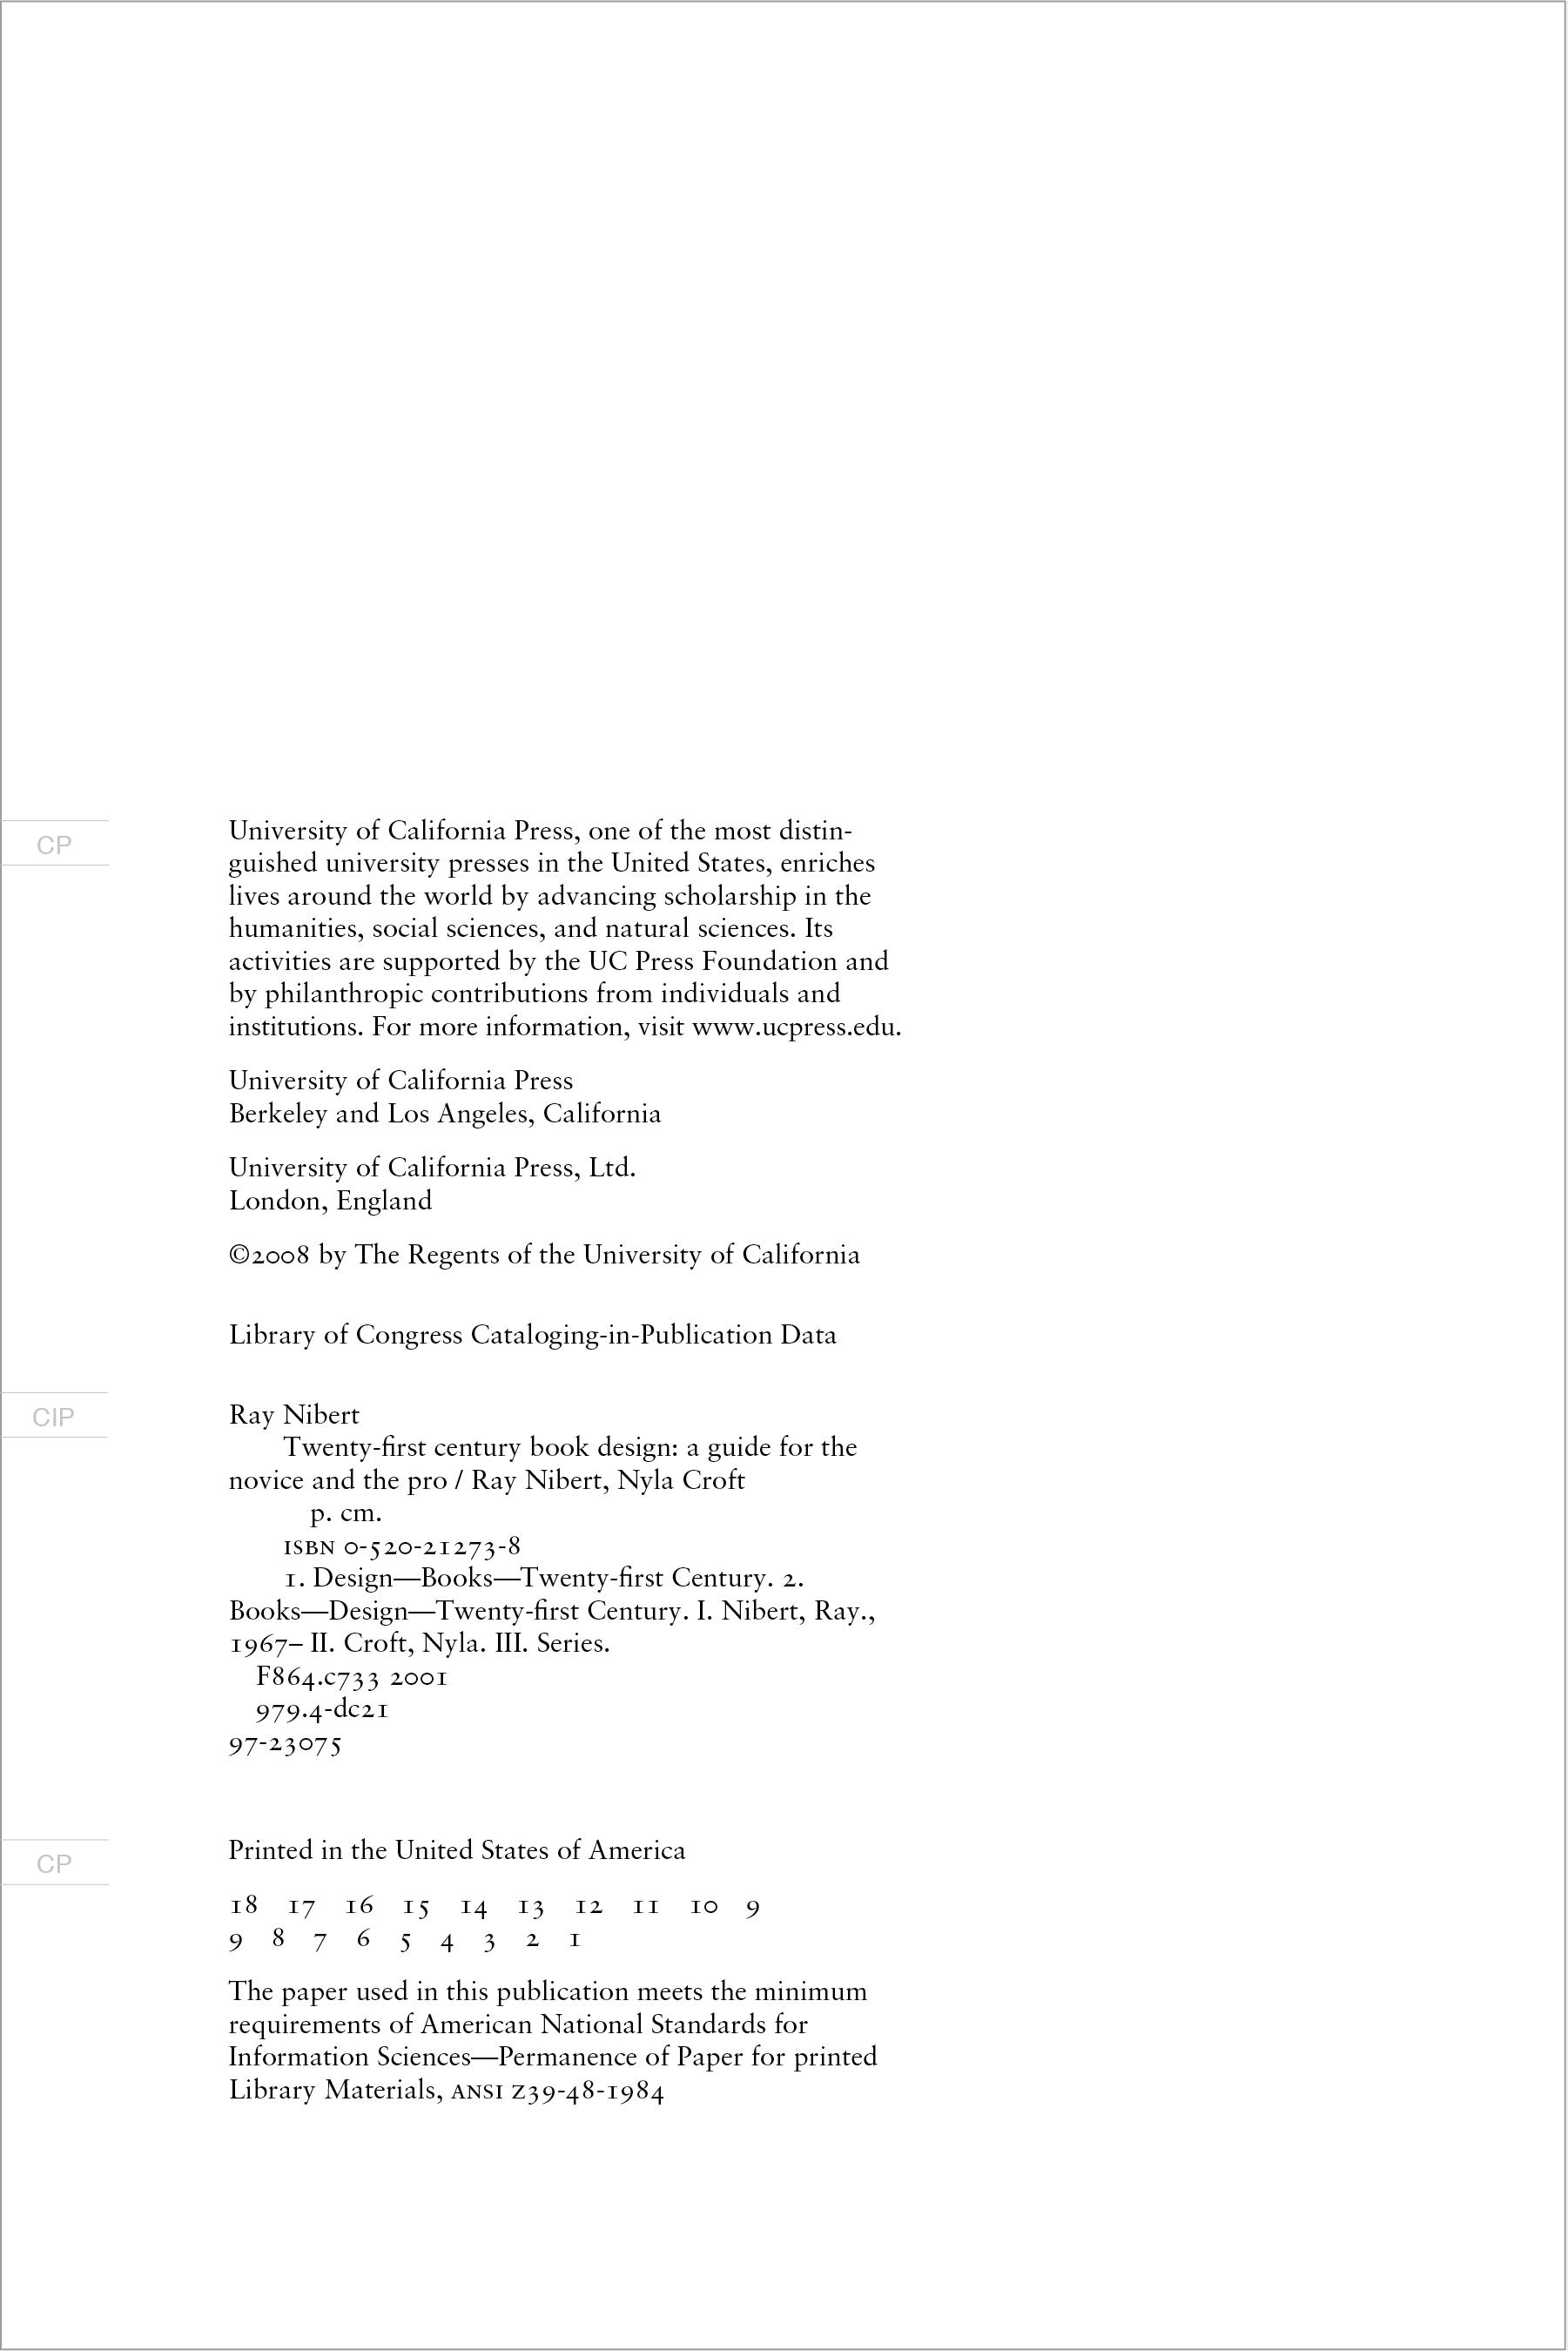 css/layouts/img/img6.jpg